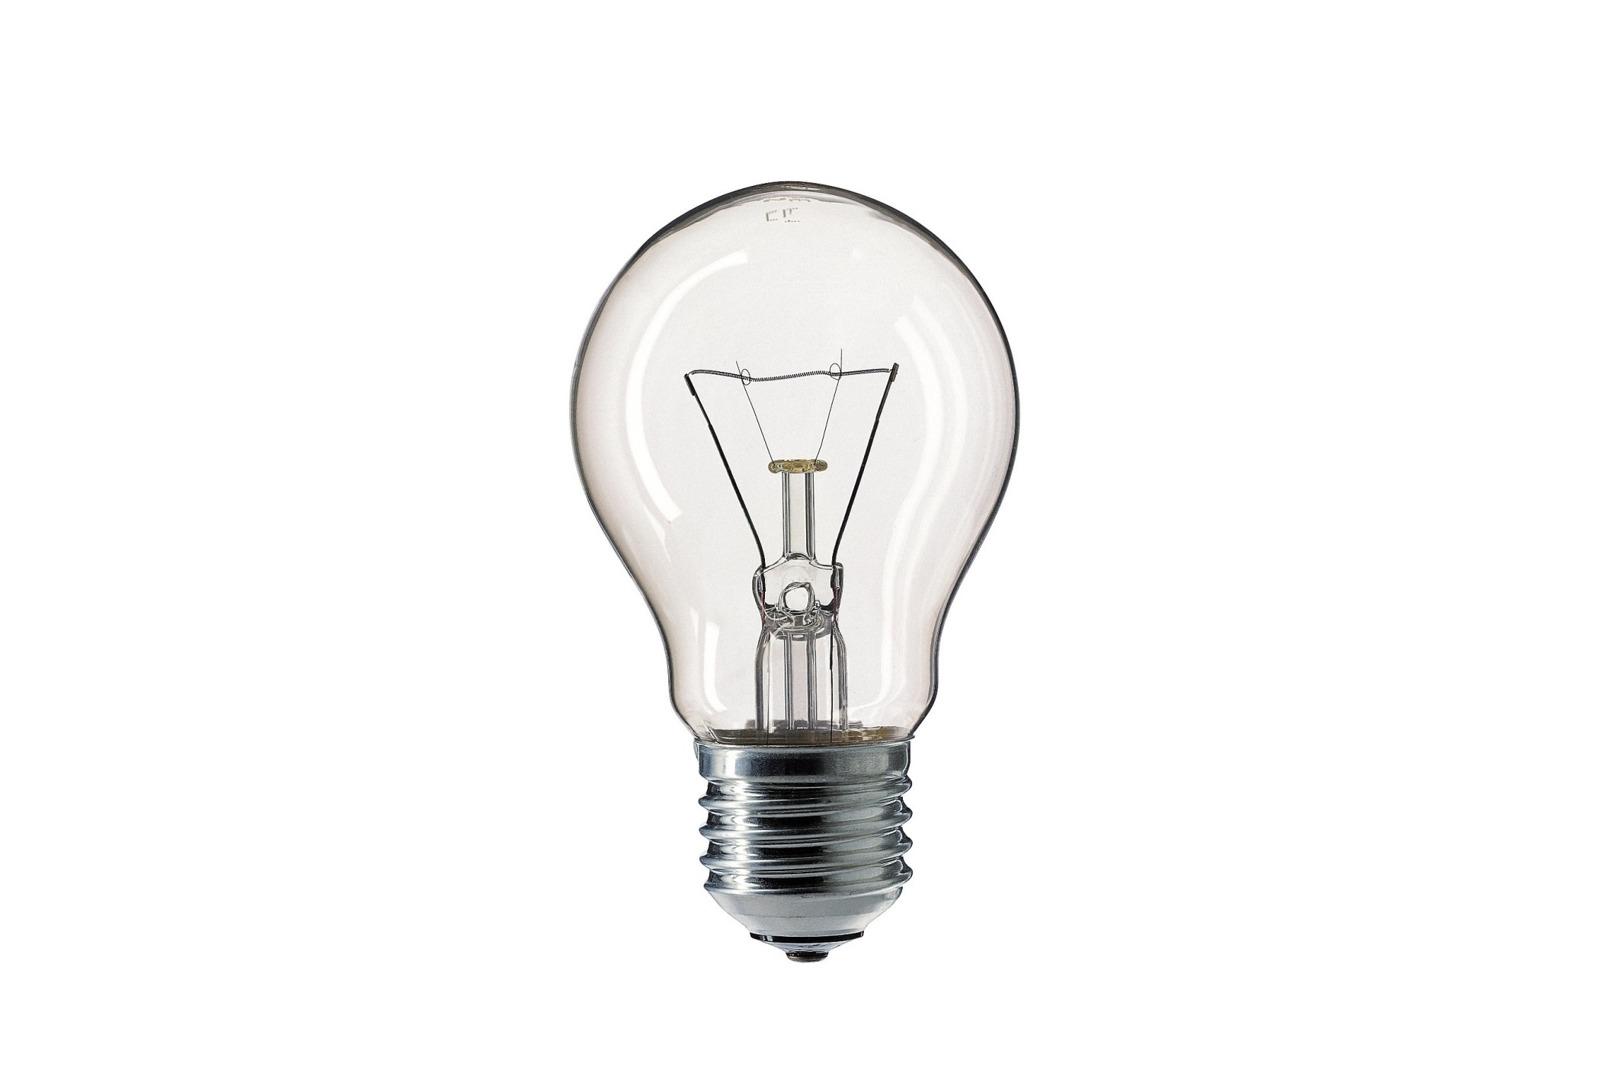 Philips Standard bulb 25W E27 120-130V A55 CL